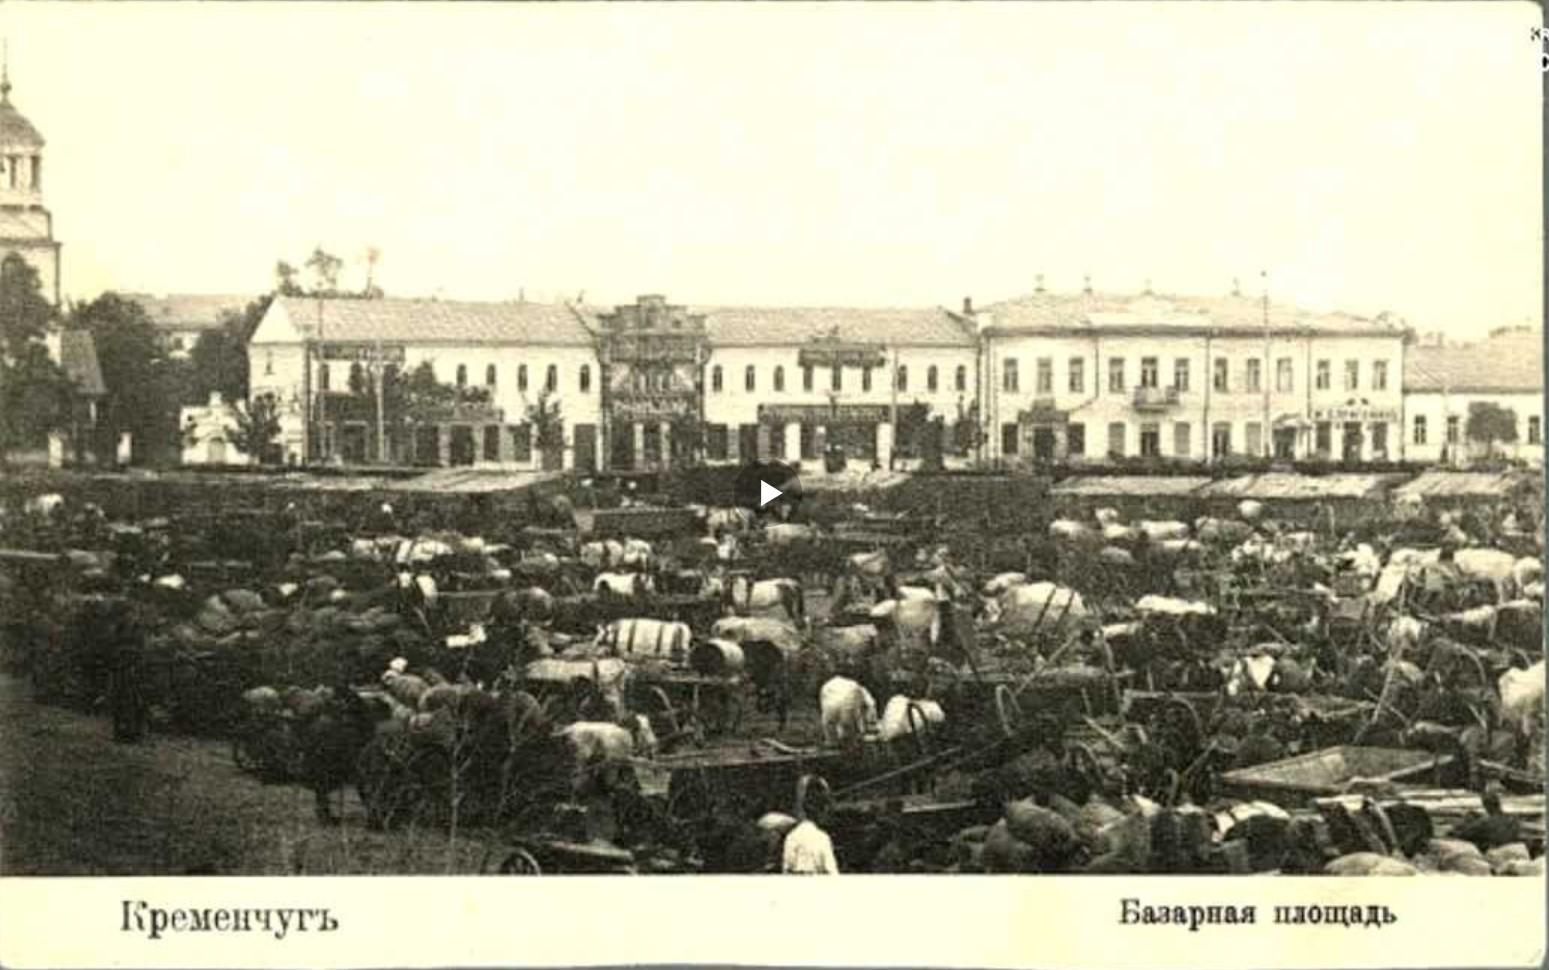 Базарная площадь